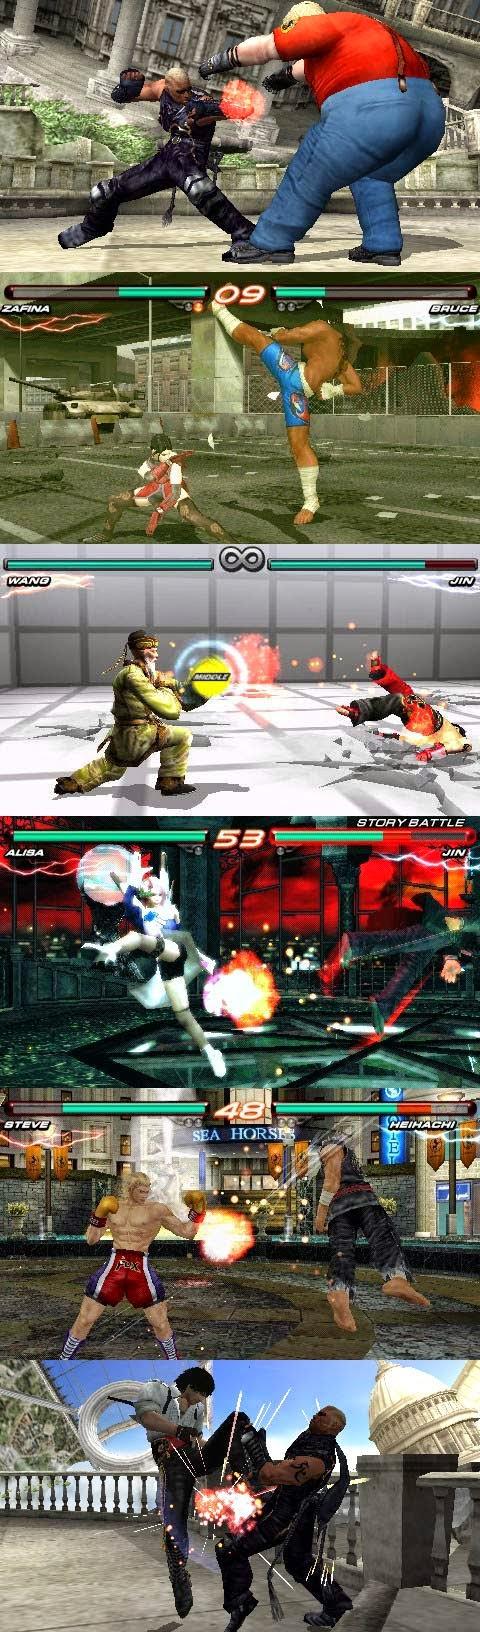 Tekken 6 Psp Save Game File